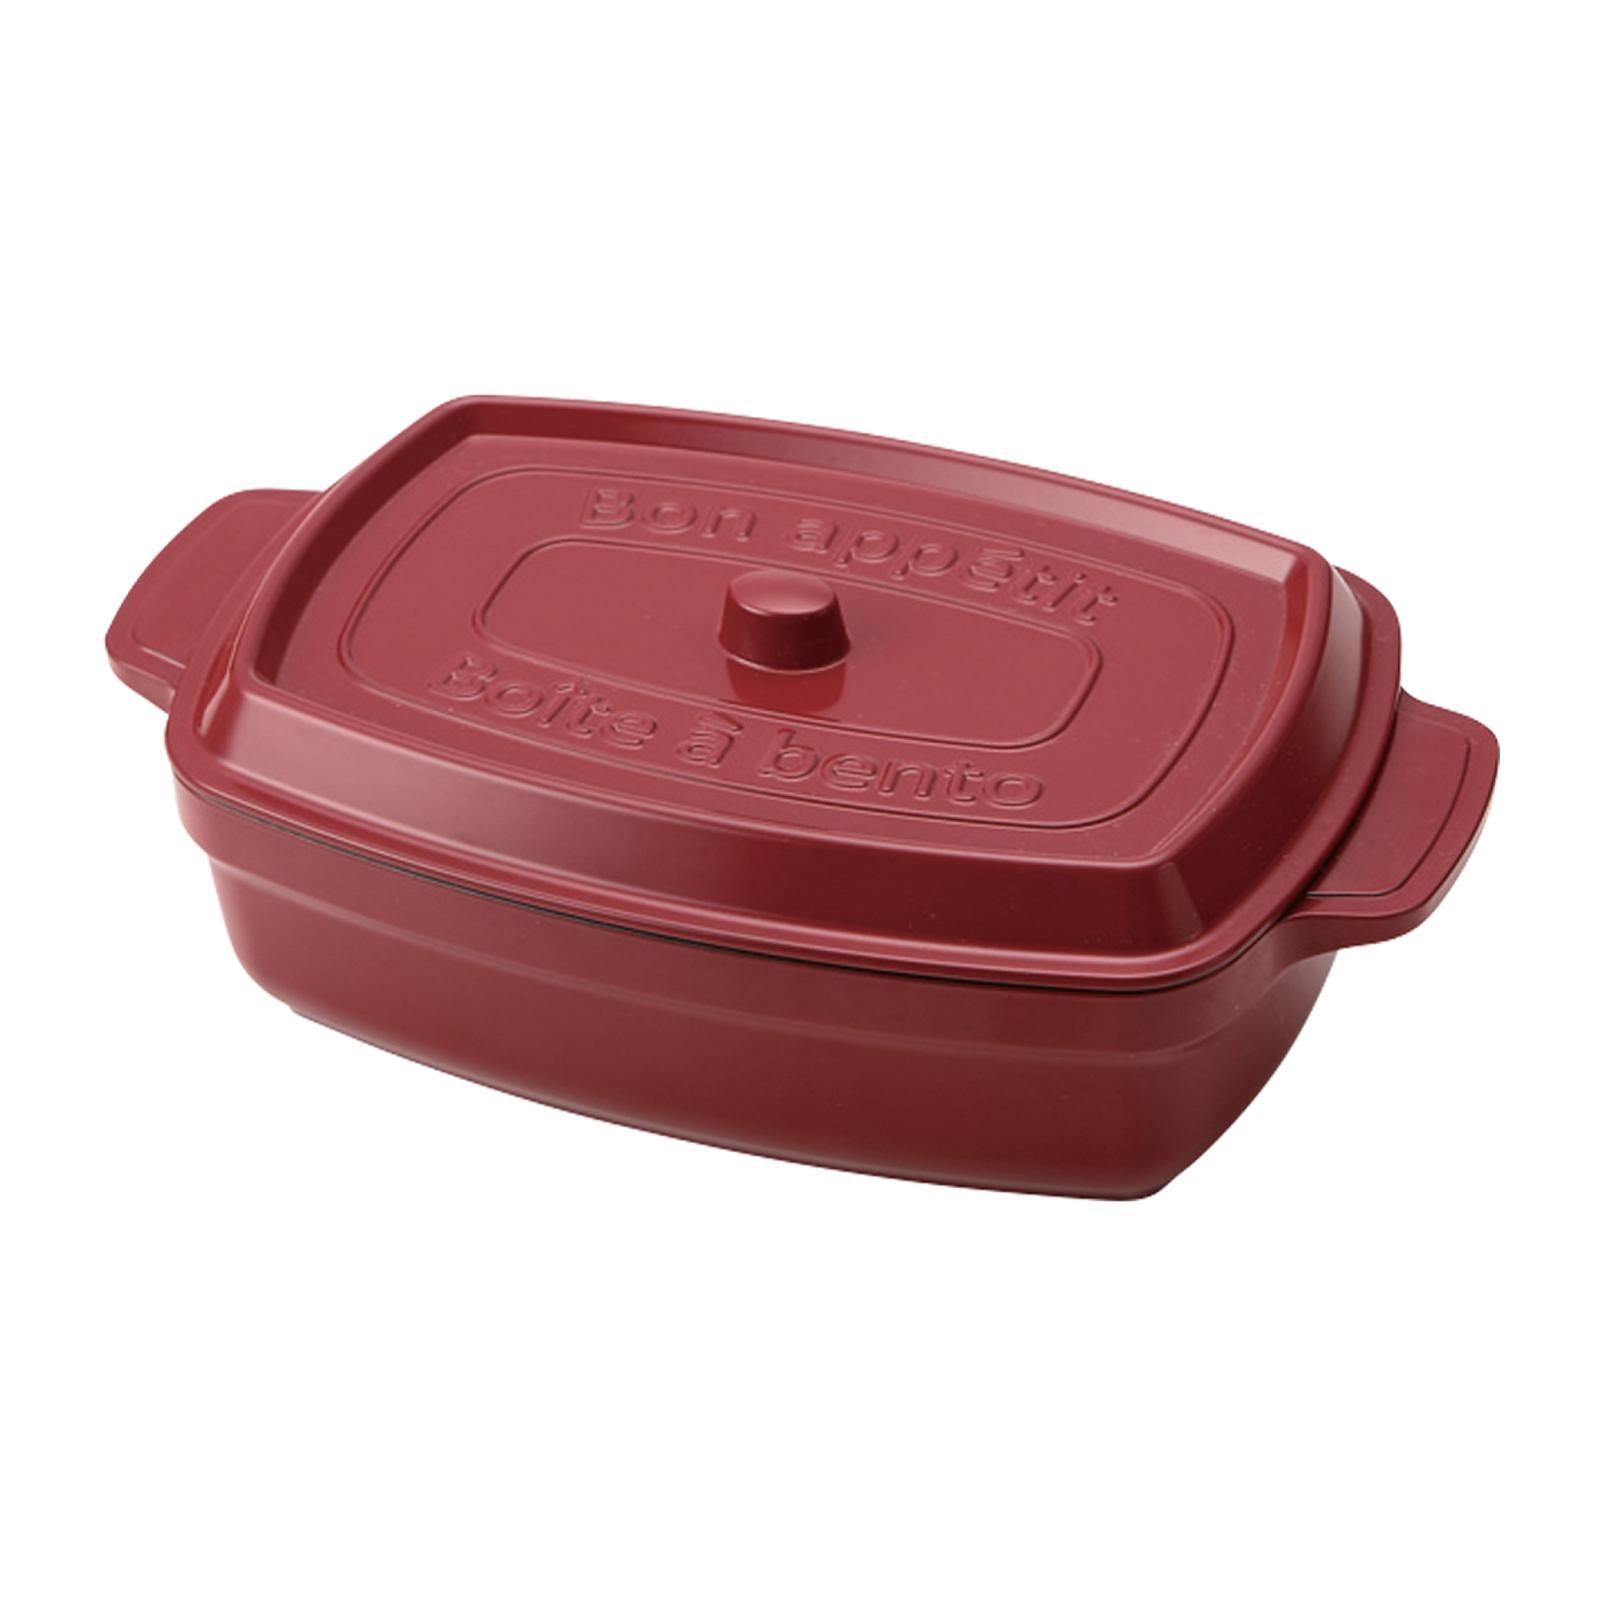 TAKENAKA Cocopot Rectangle Bento Lunch Box - Red